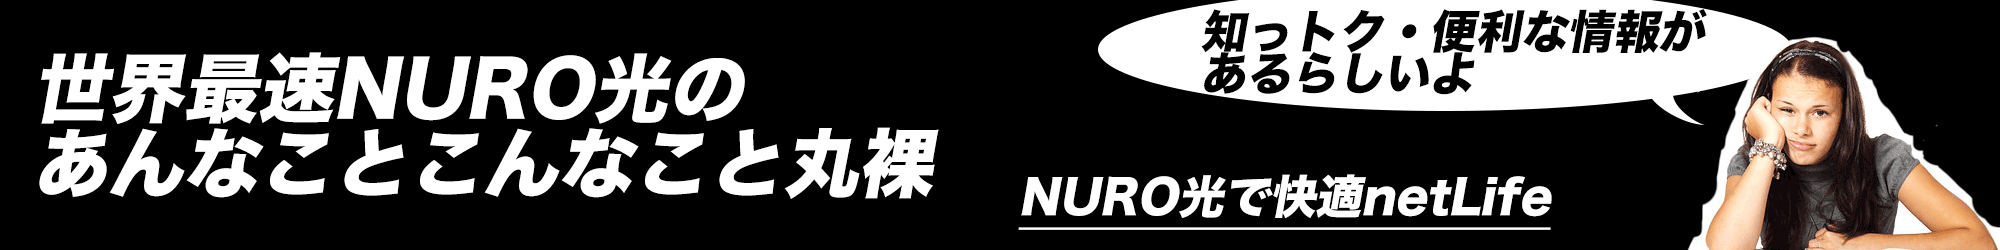 NURO光で快適netLife